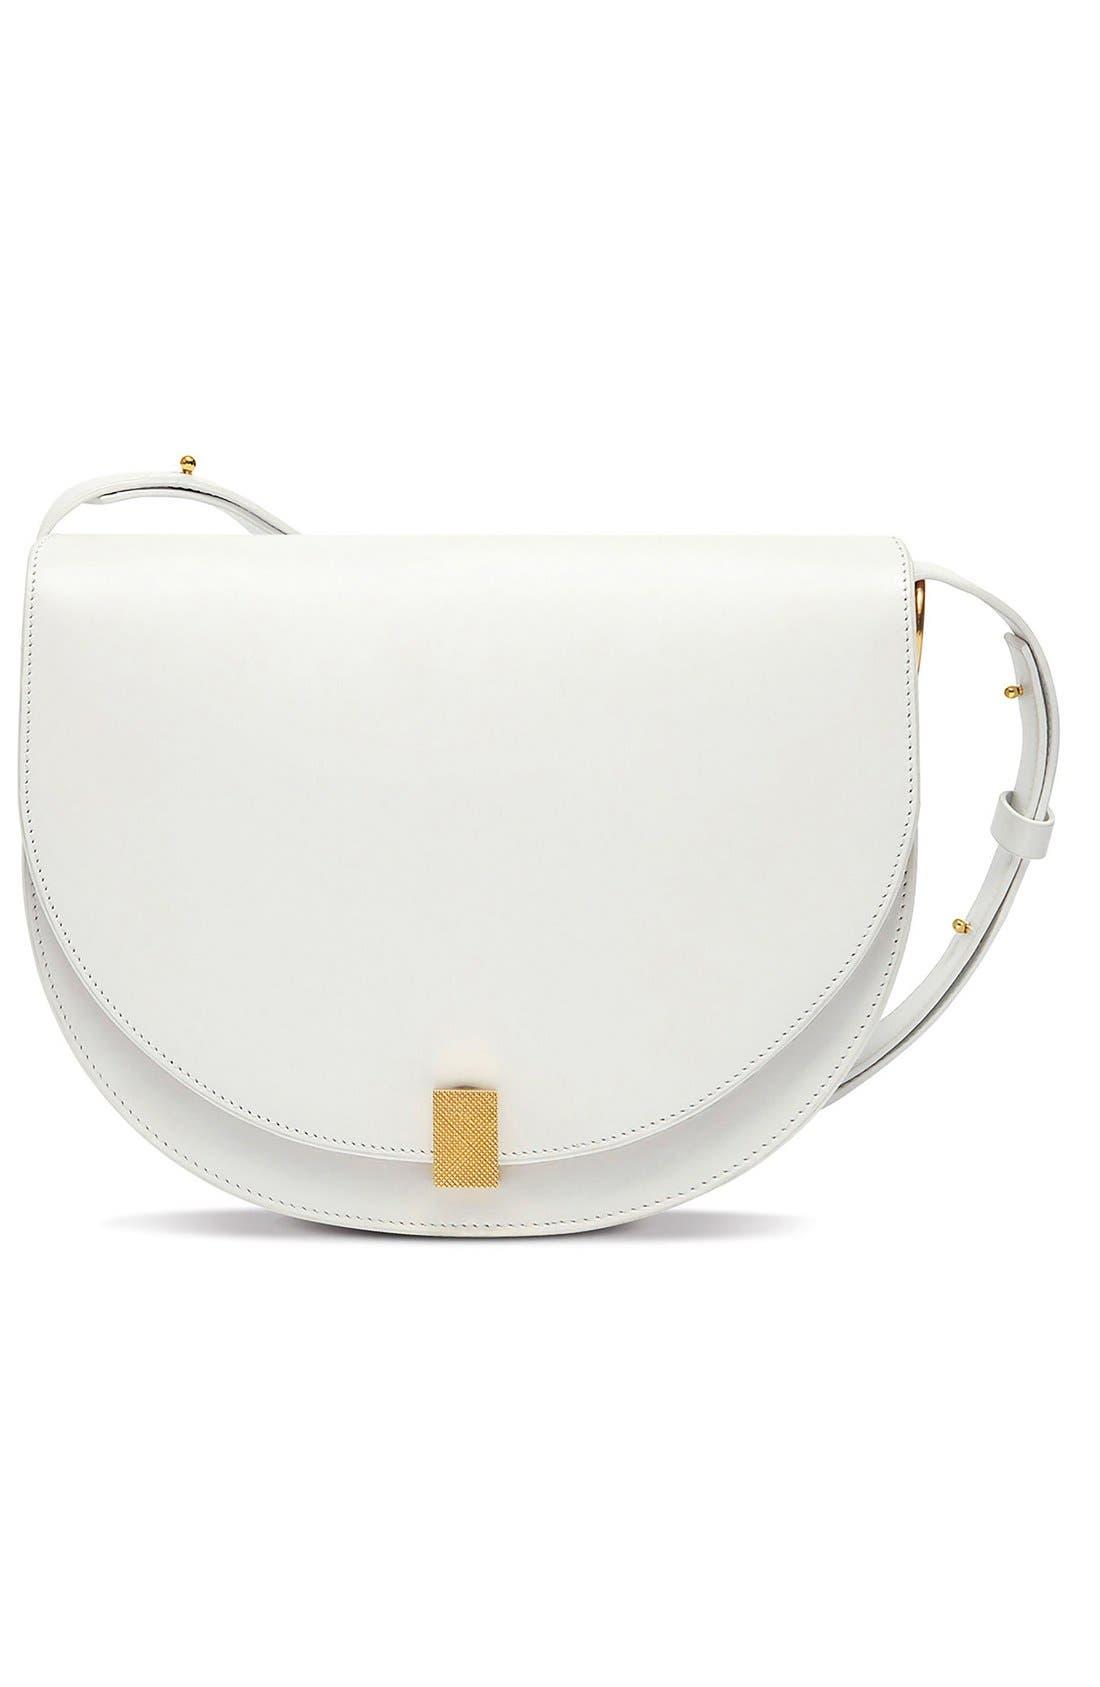 Main Image - Victoria Beckham Half Moon Box Shoulder Bag